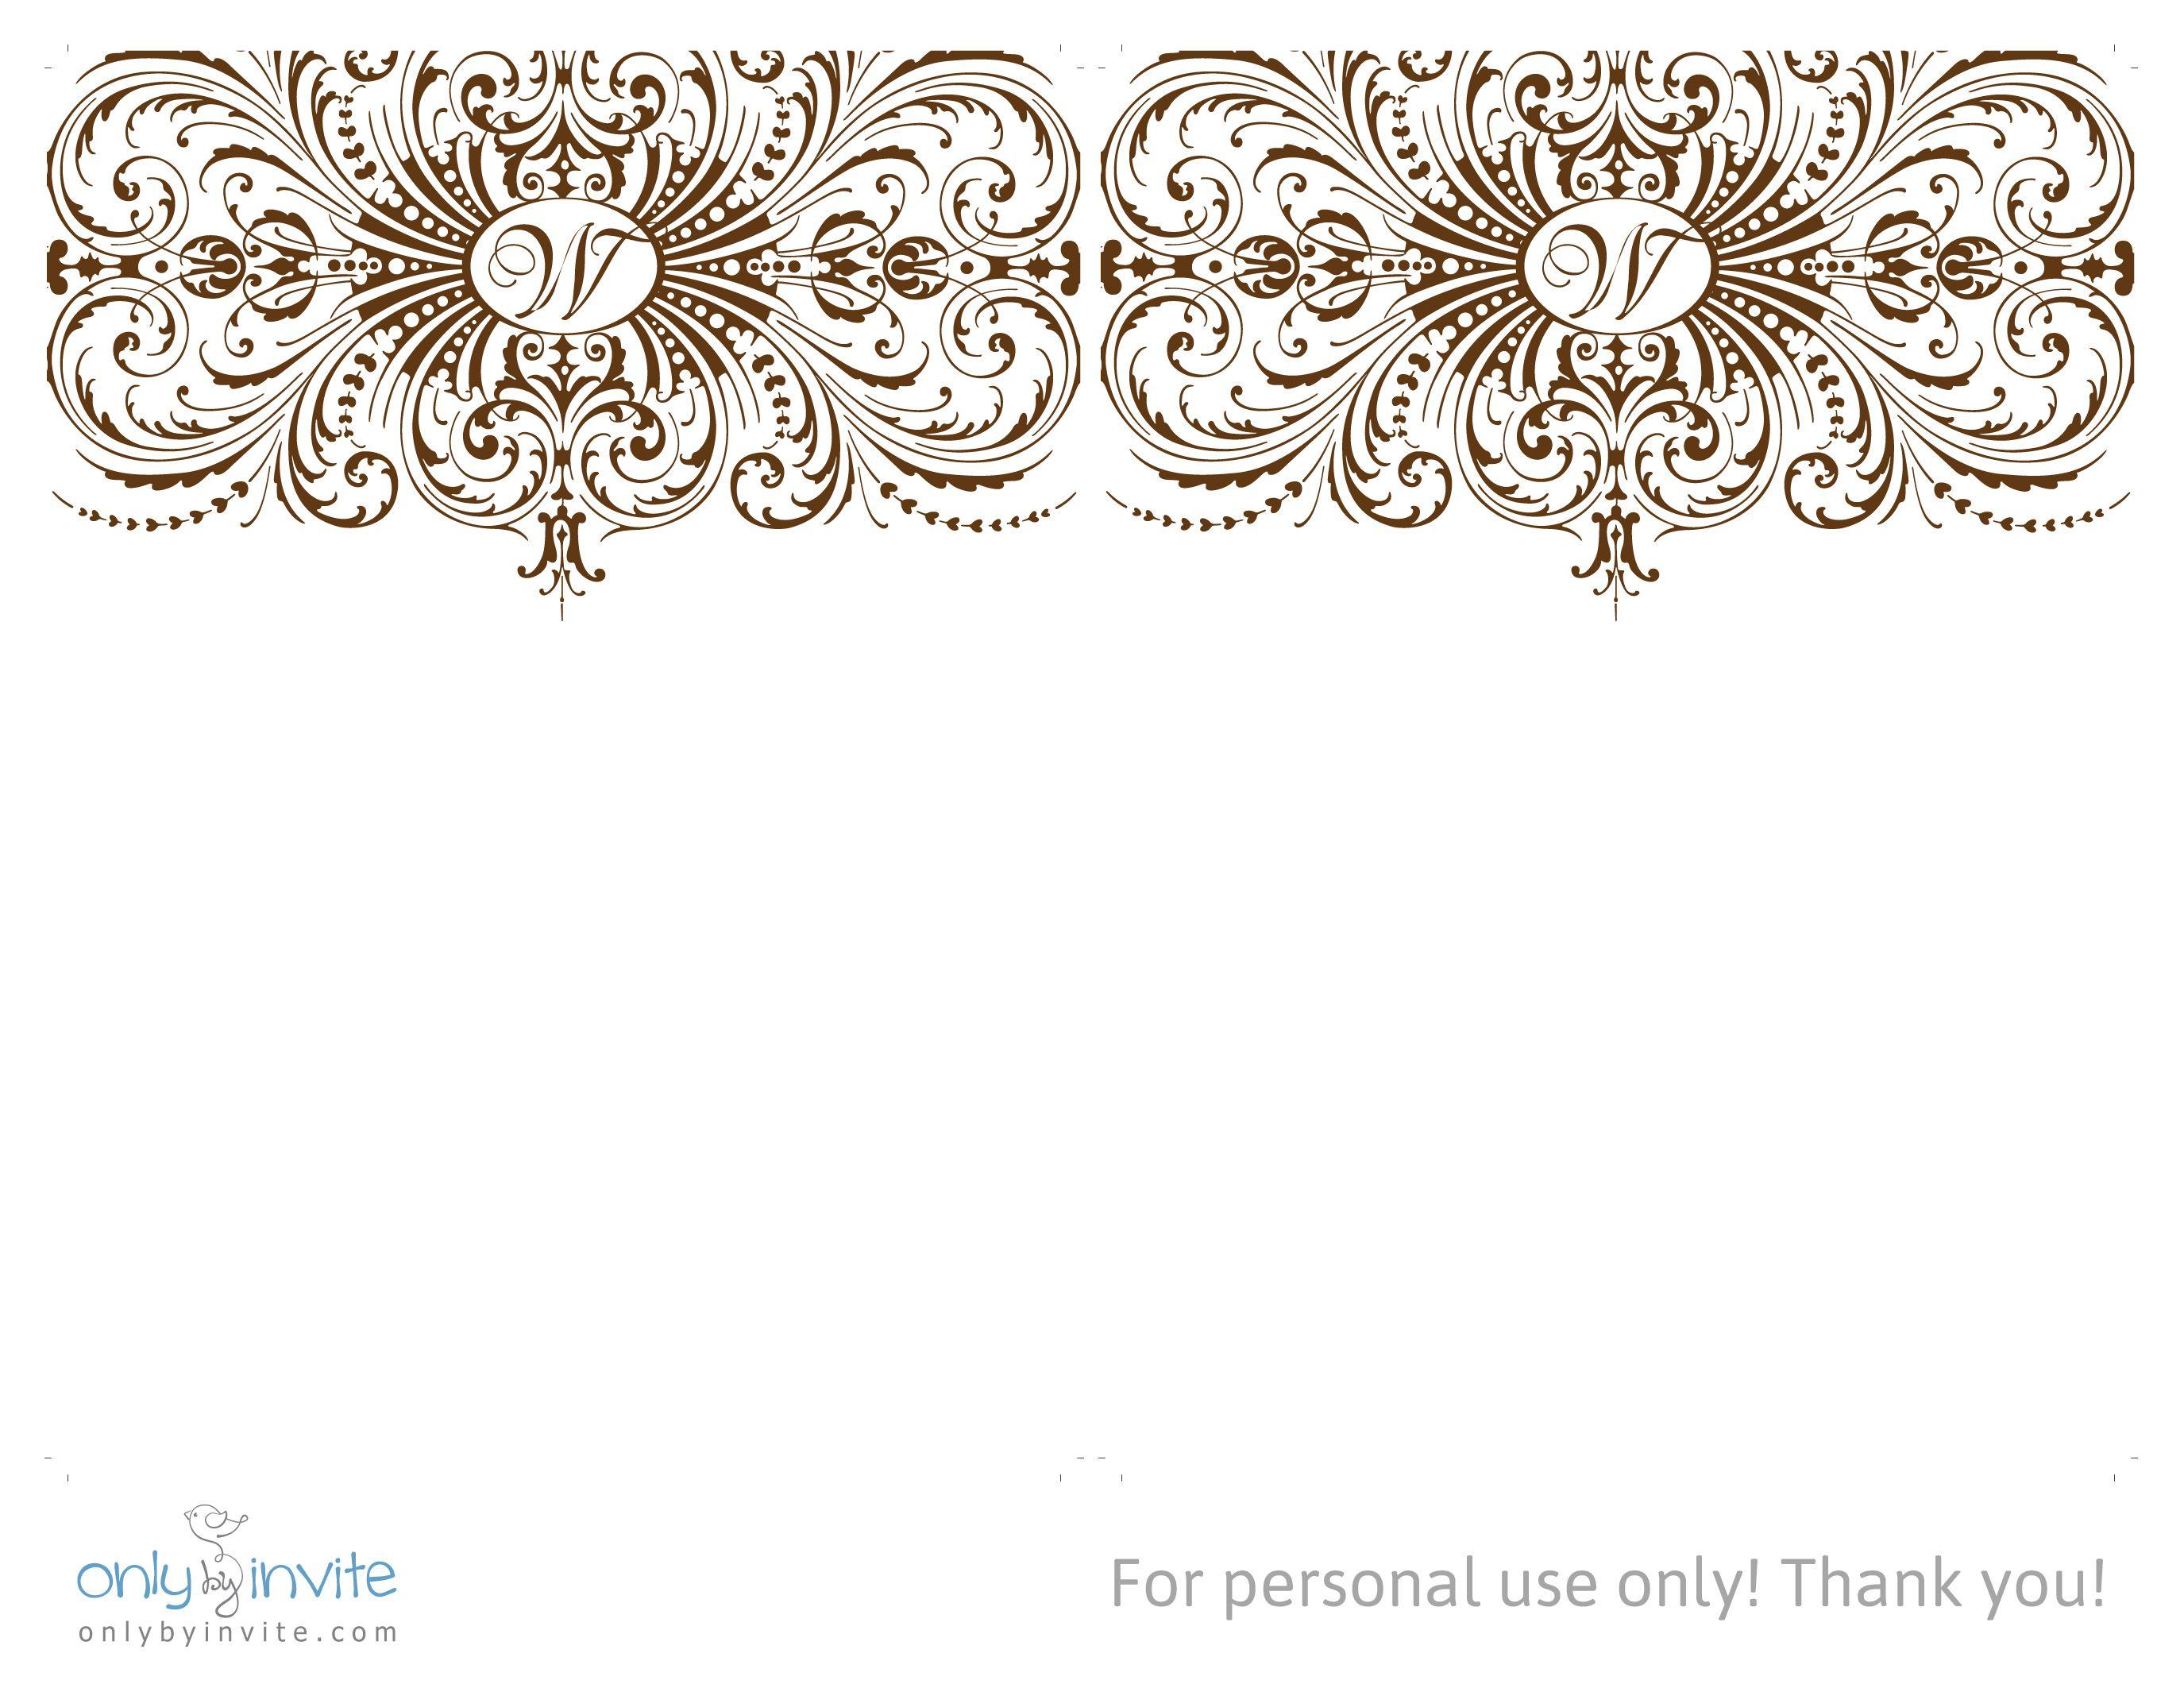 Calligraphic lace wedding invitation wedding invitation wedding invitations templates http webdesign latest wedding invitation wording samples sat feb monicamarmolfo Choice Image